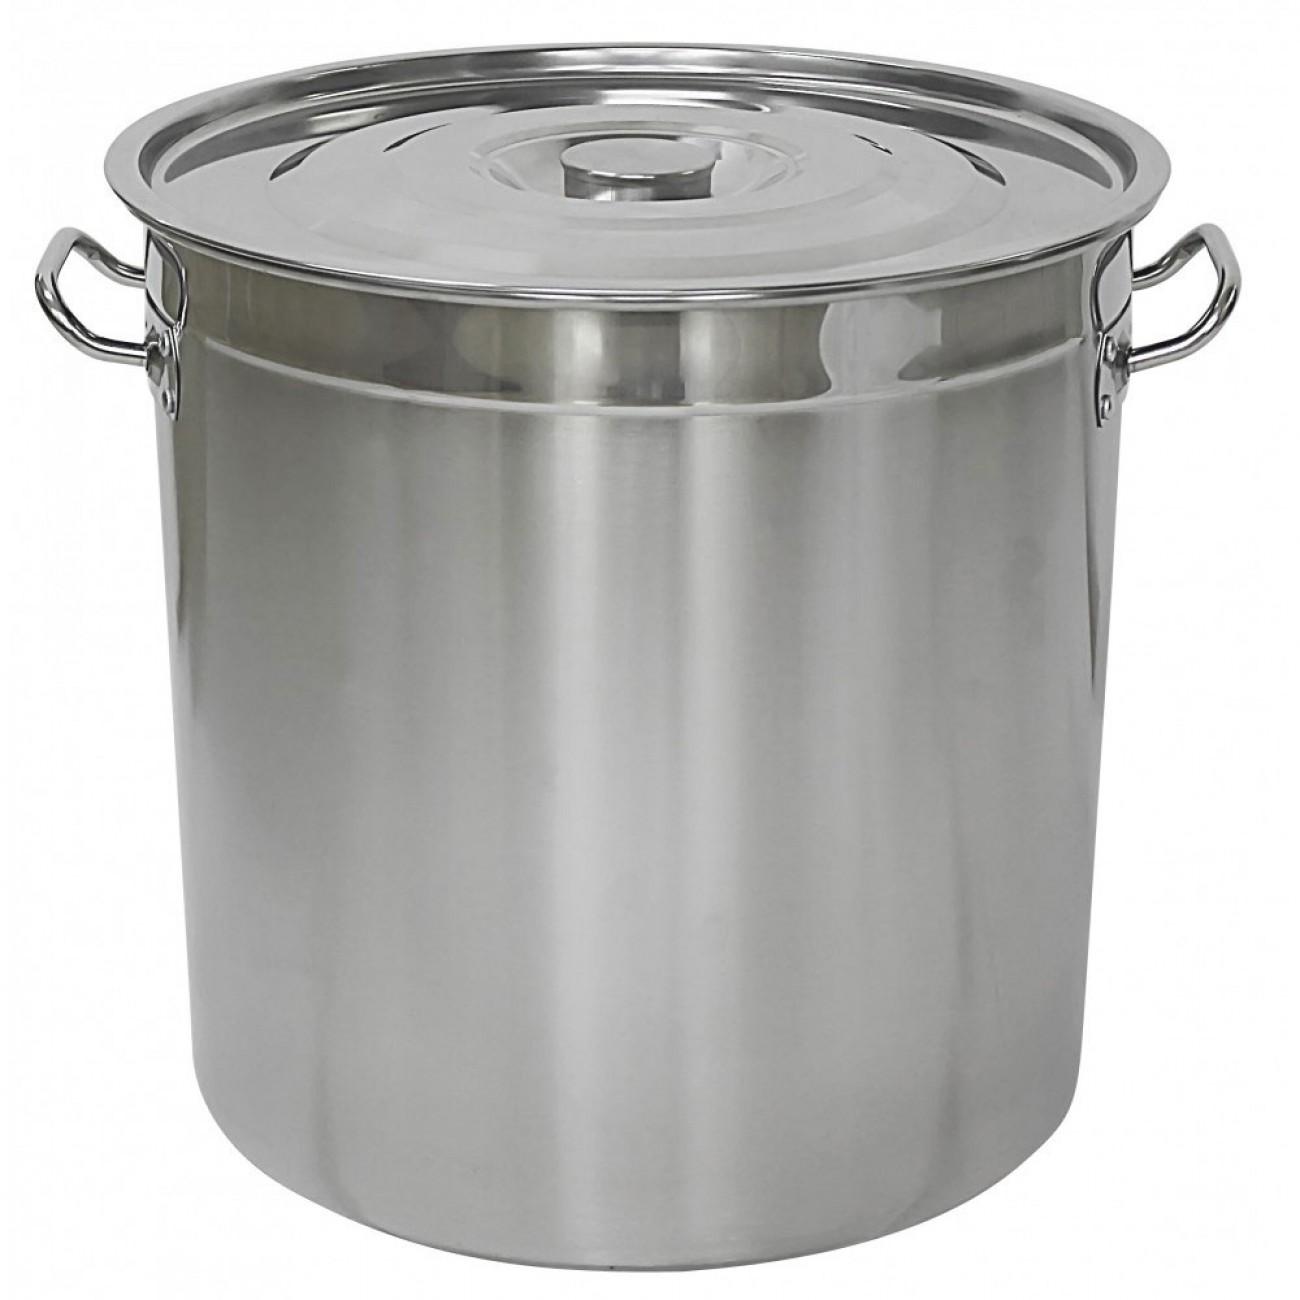 Казан SAPIR SP 1211 B40, 42 см, 56.5 литра, Неръждаема стомана в Тенджери - SAPIR | Alleop